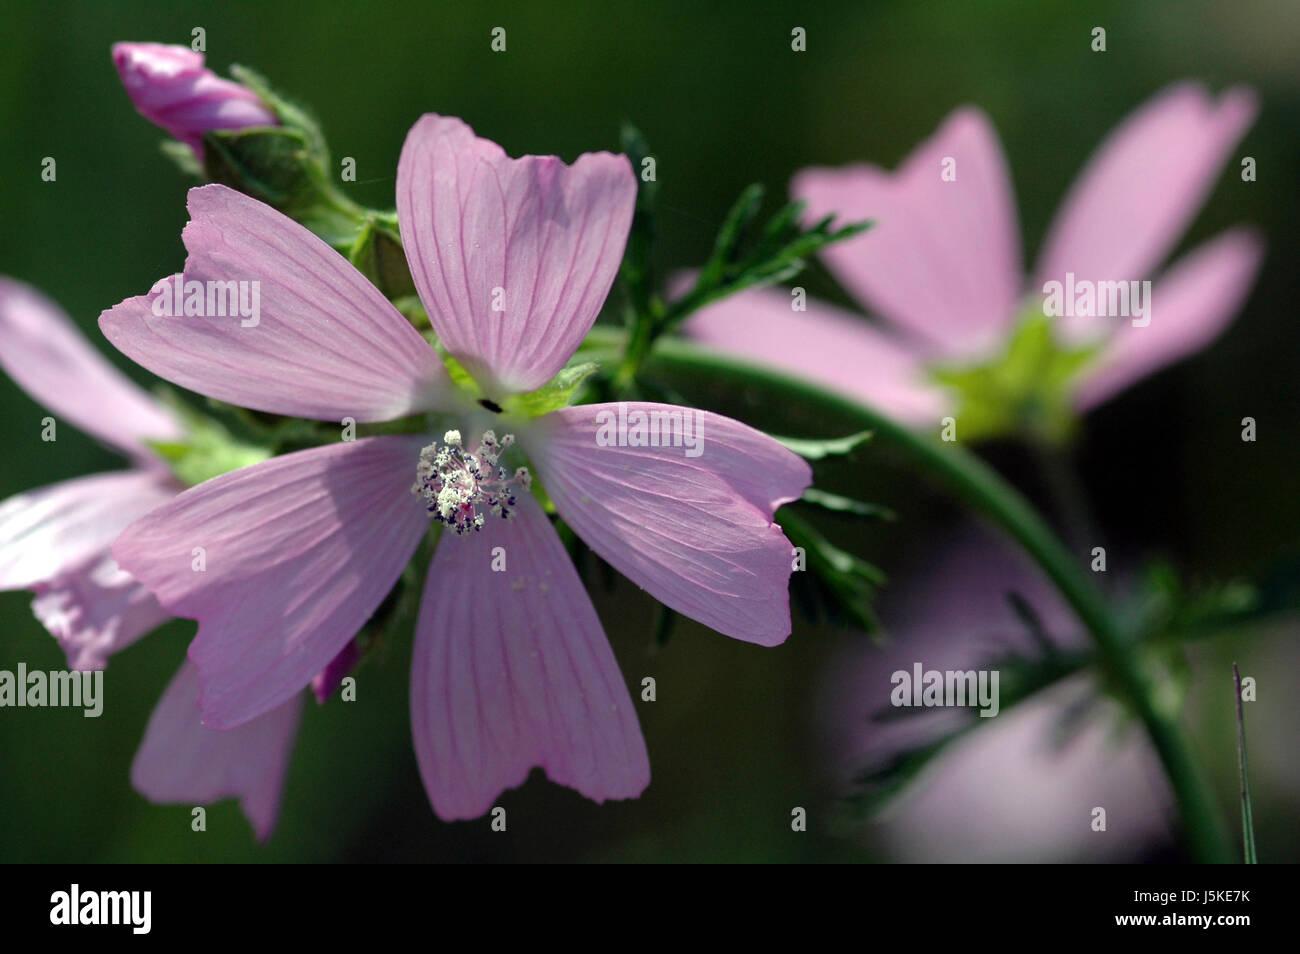 glass chalice tumbler plant bloom blossom flourish flourishing leaves botany Stock Photo